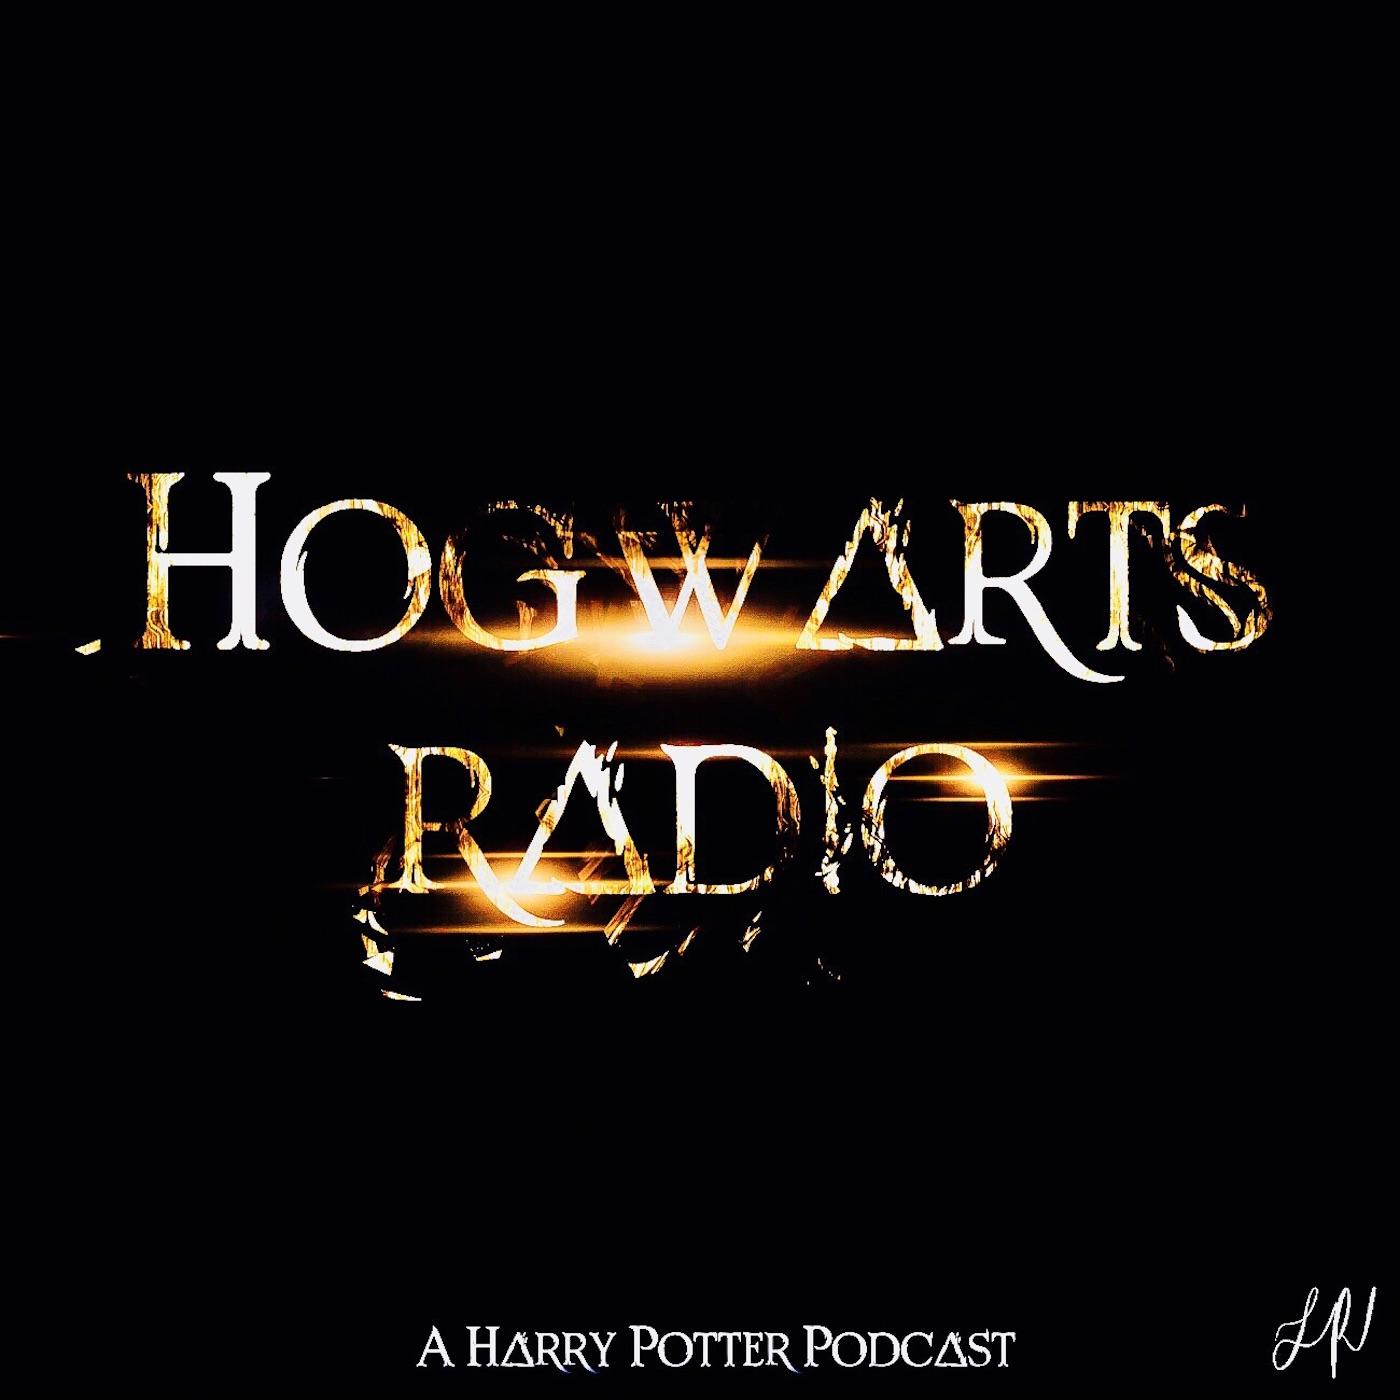 Hogwarts Radio   Feeding your Harry Potter addiction since 2008! show art